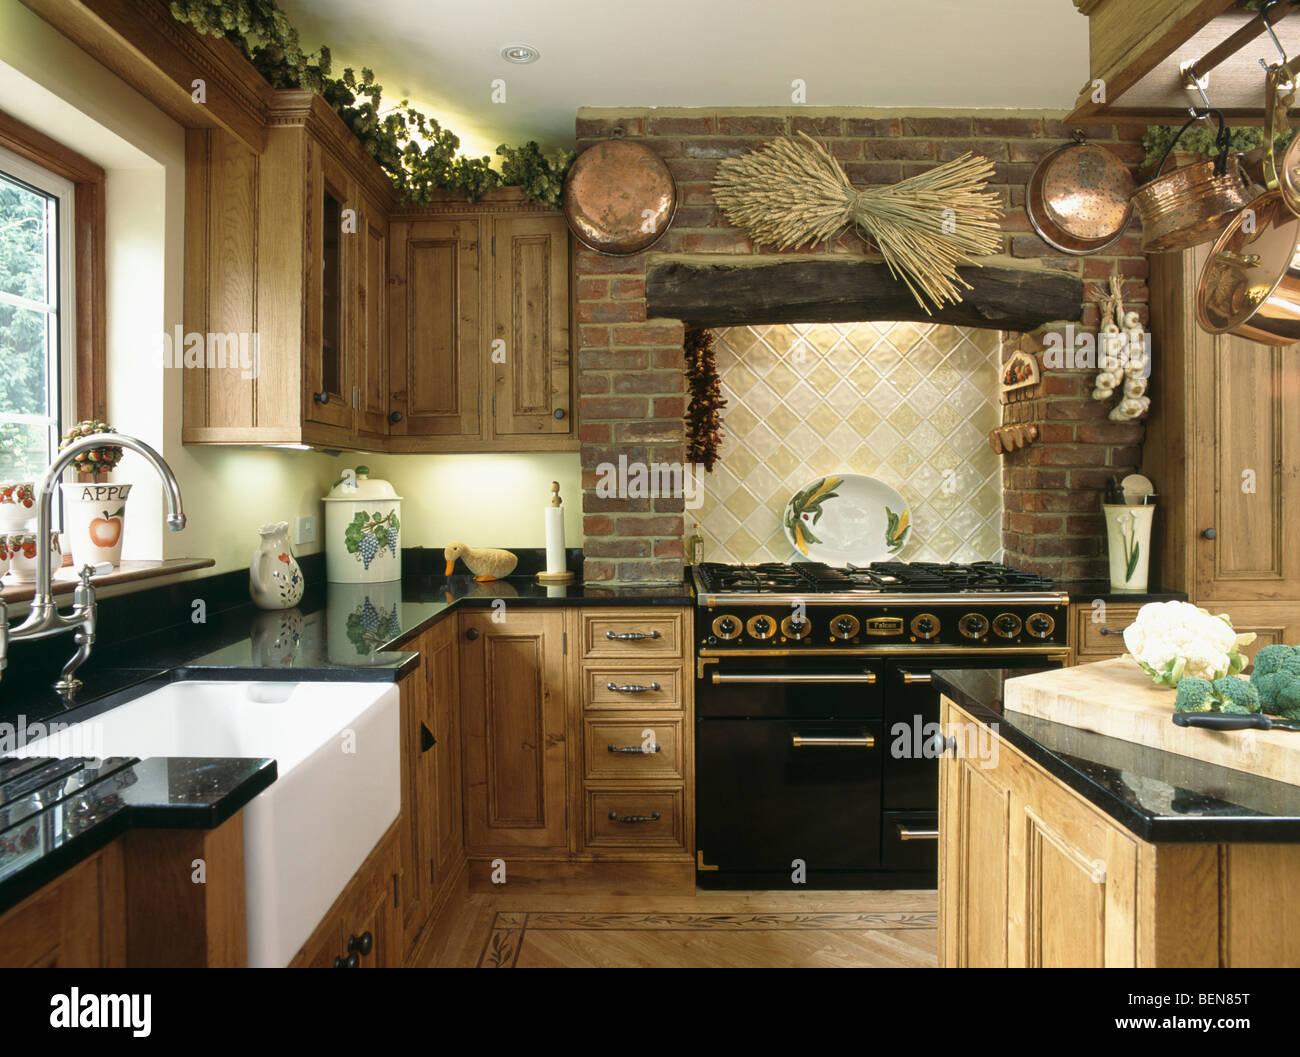 Interiors Kitchens Traditional Sinks Stockfotos & Interiors Kitchens ...